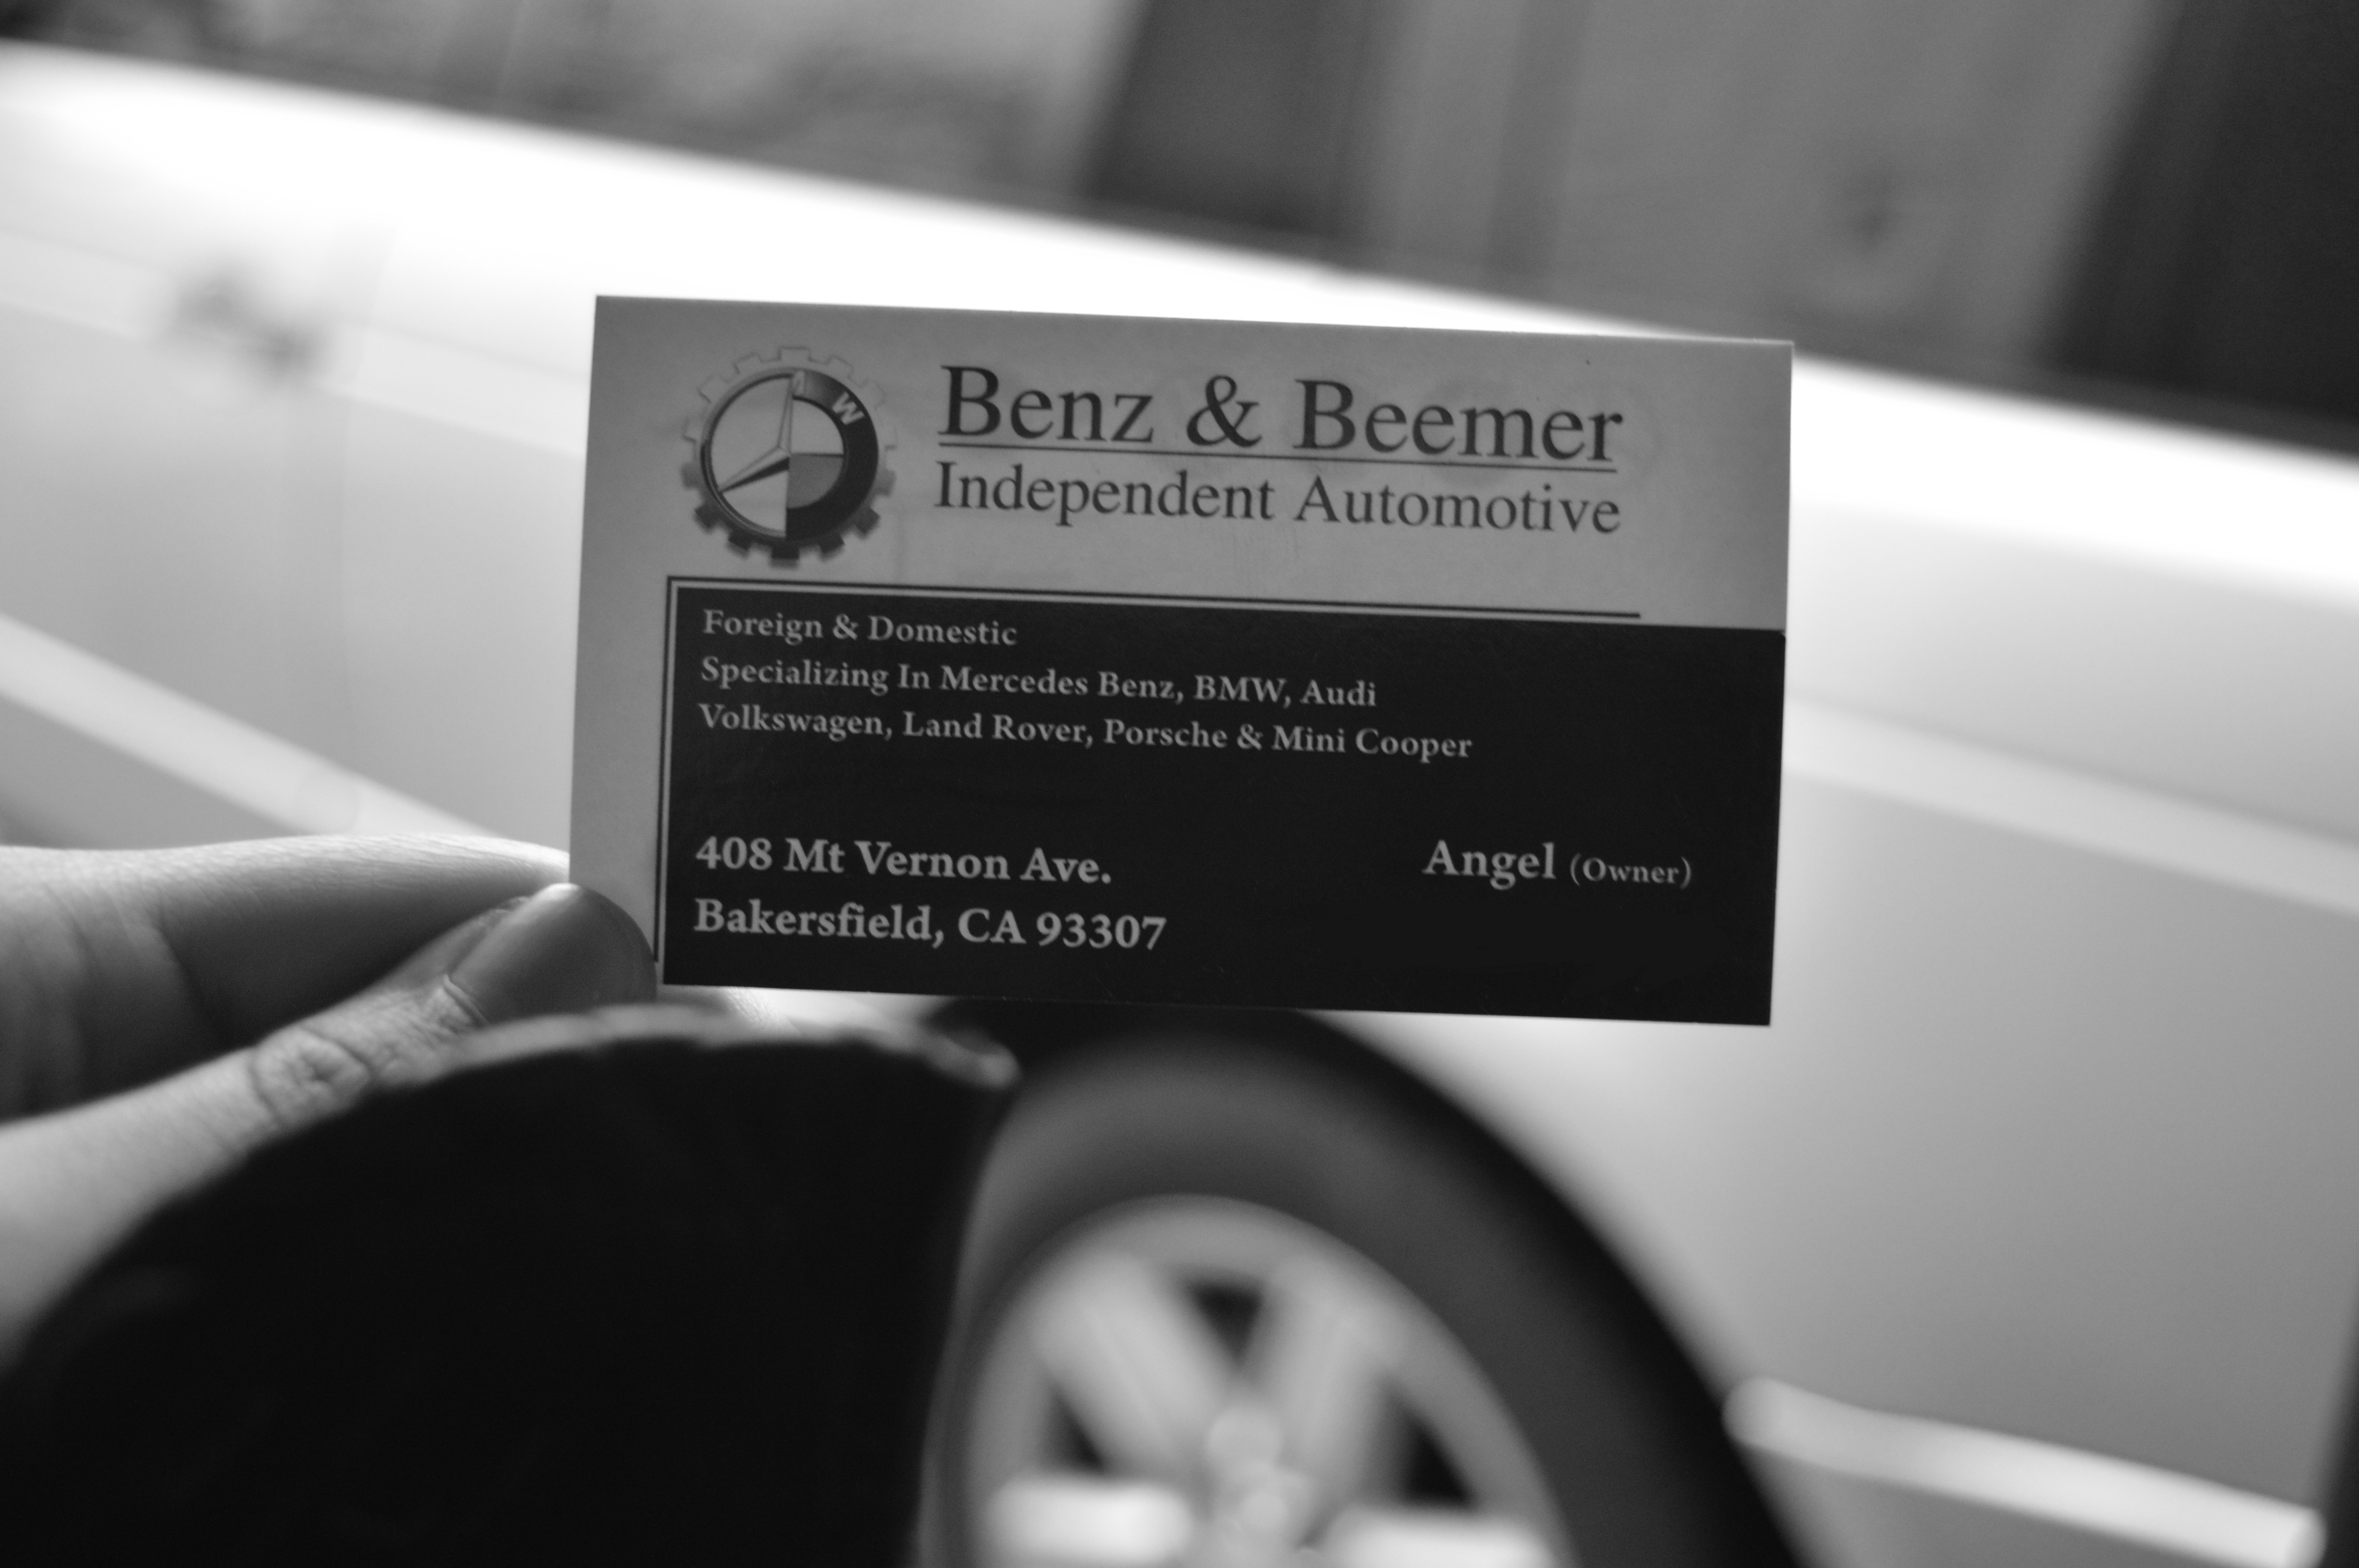 Benz Beemer Independent Automotive 408 Mount Vernon Ave